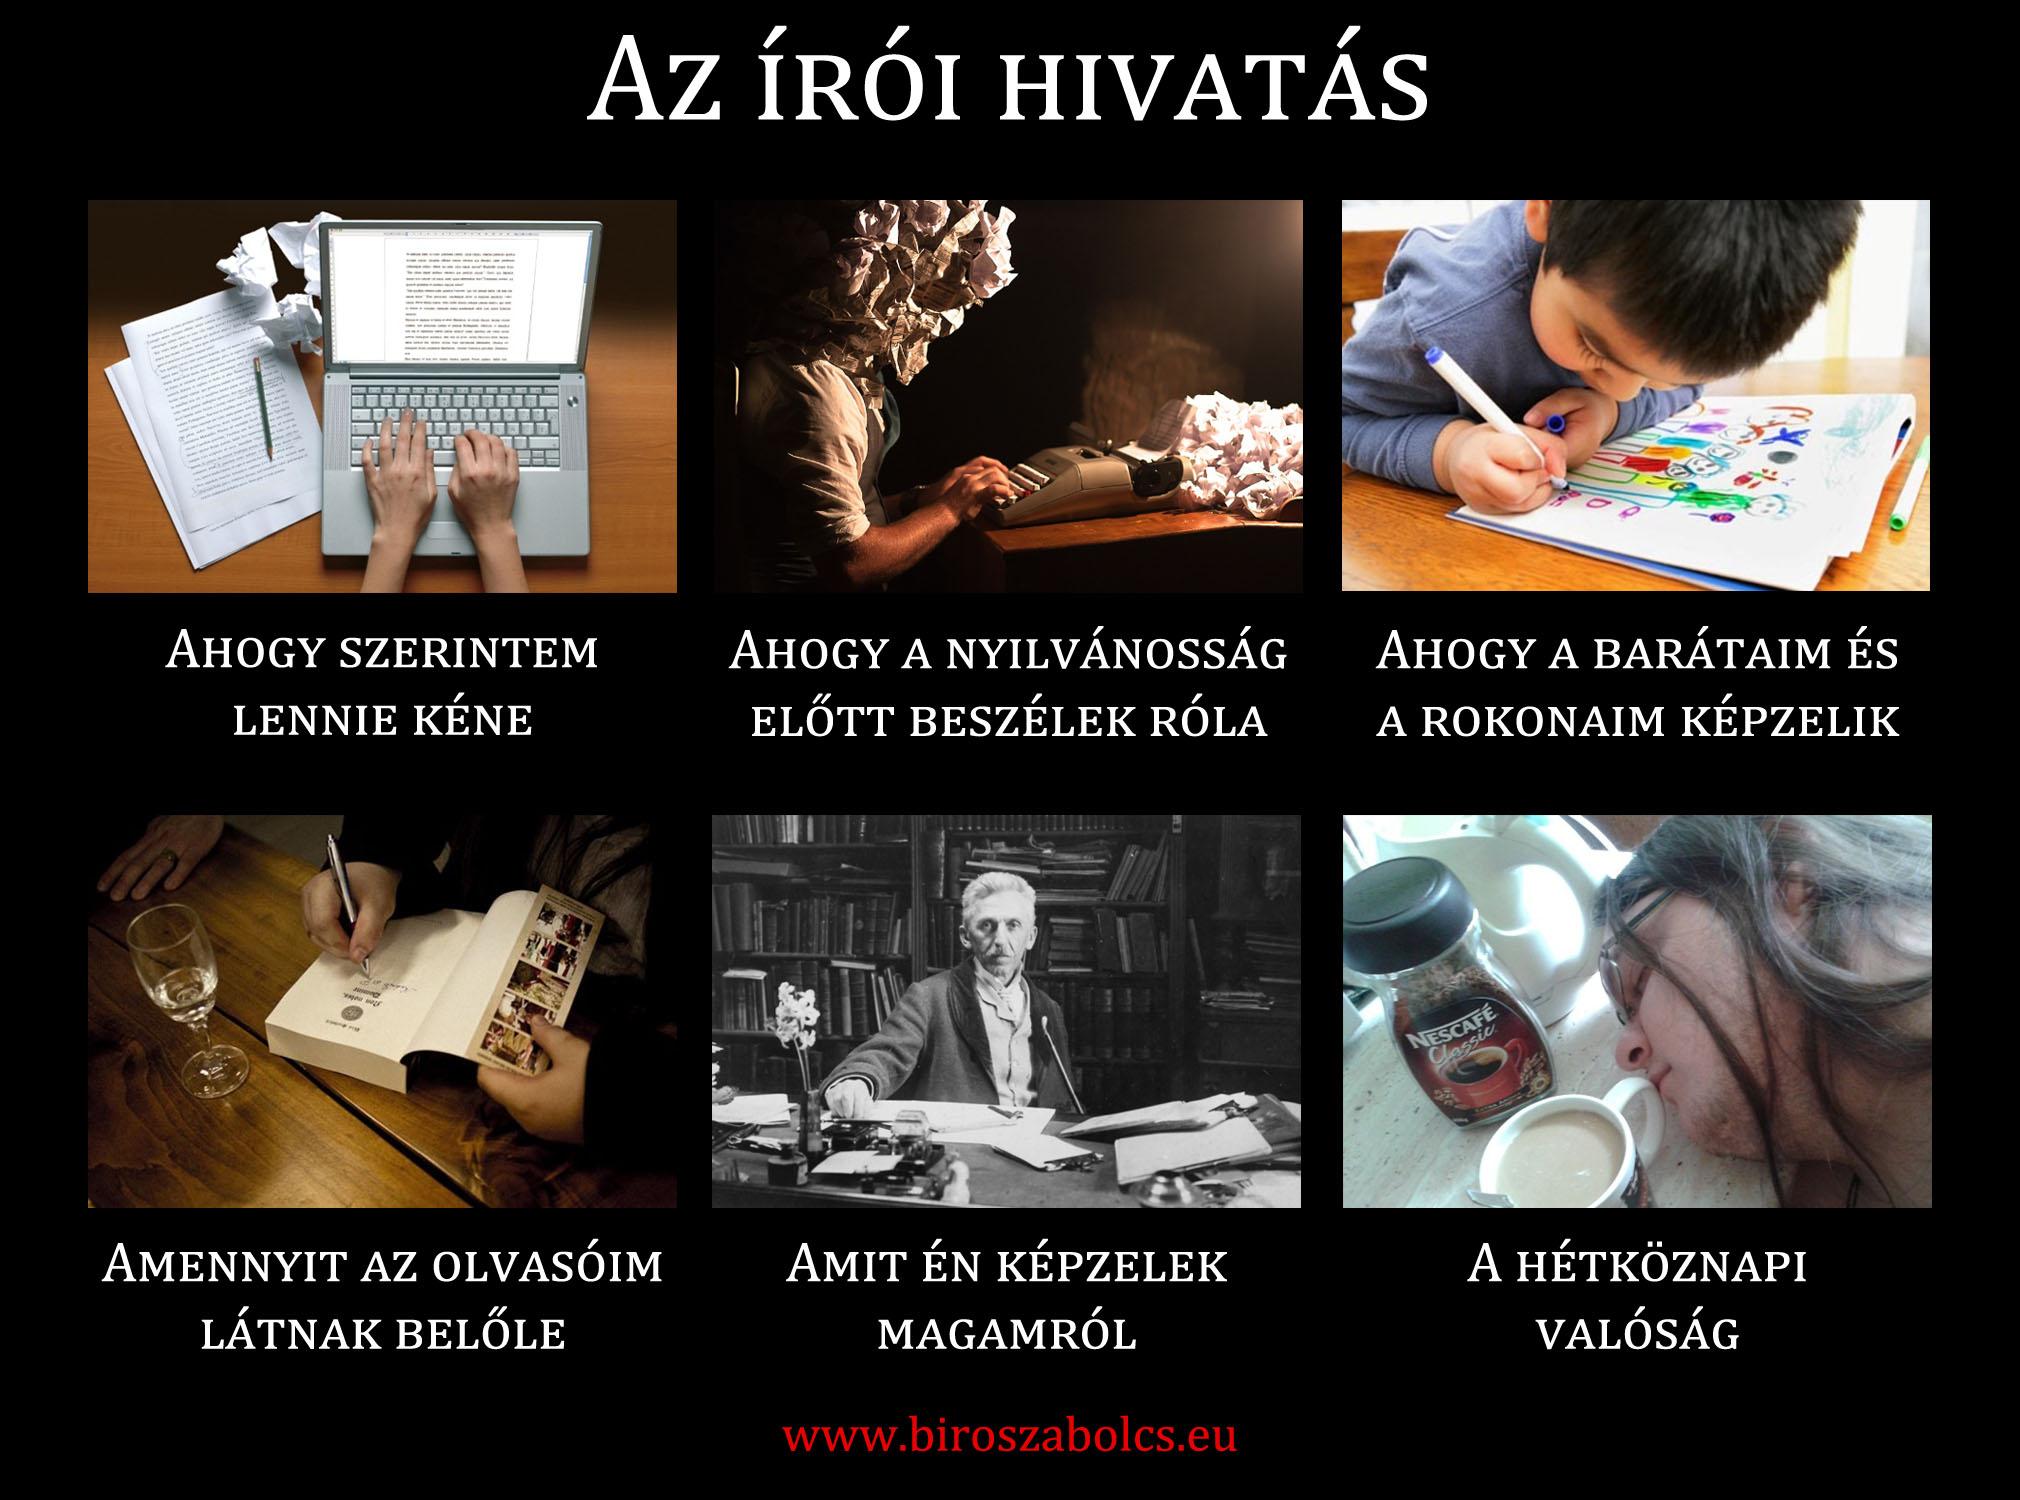 az_iroi_hivatas_meme.jpg